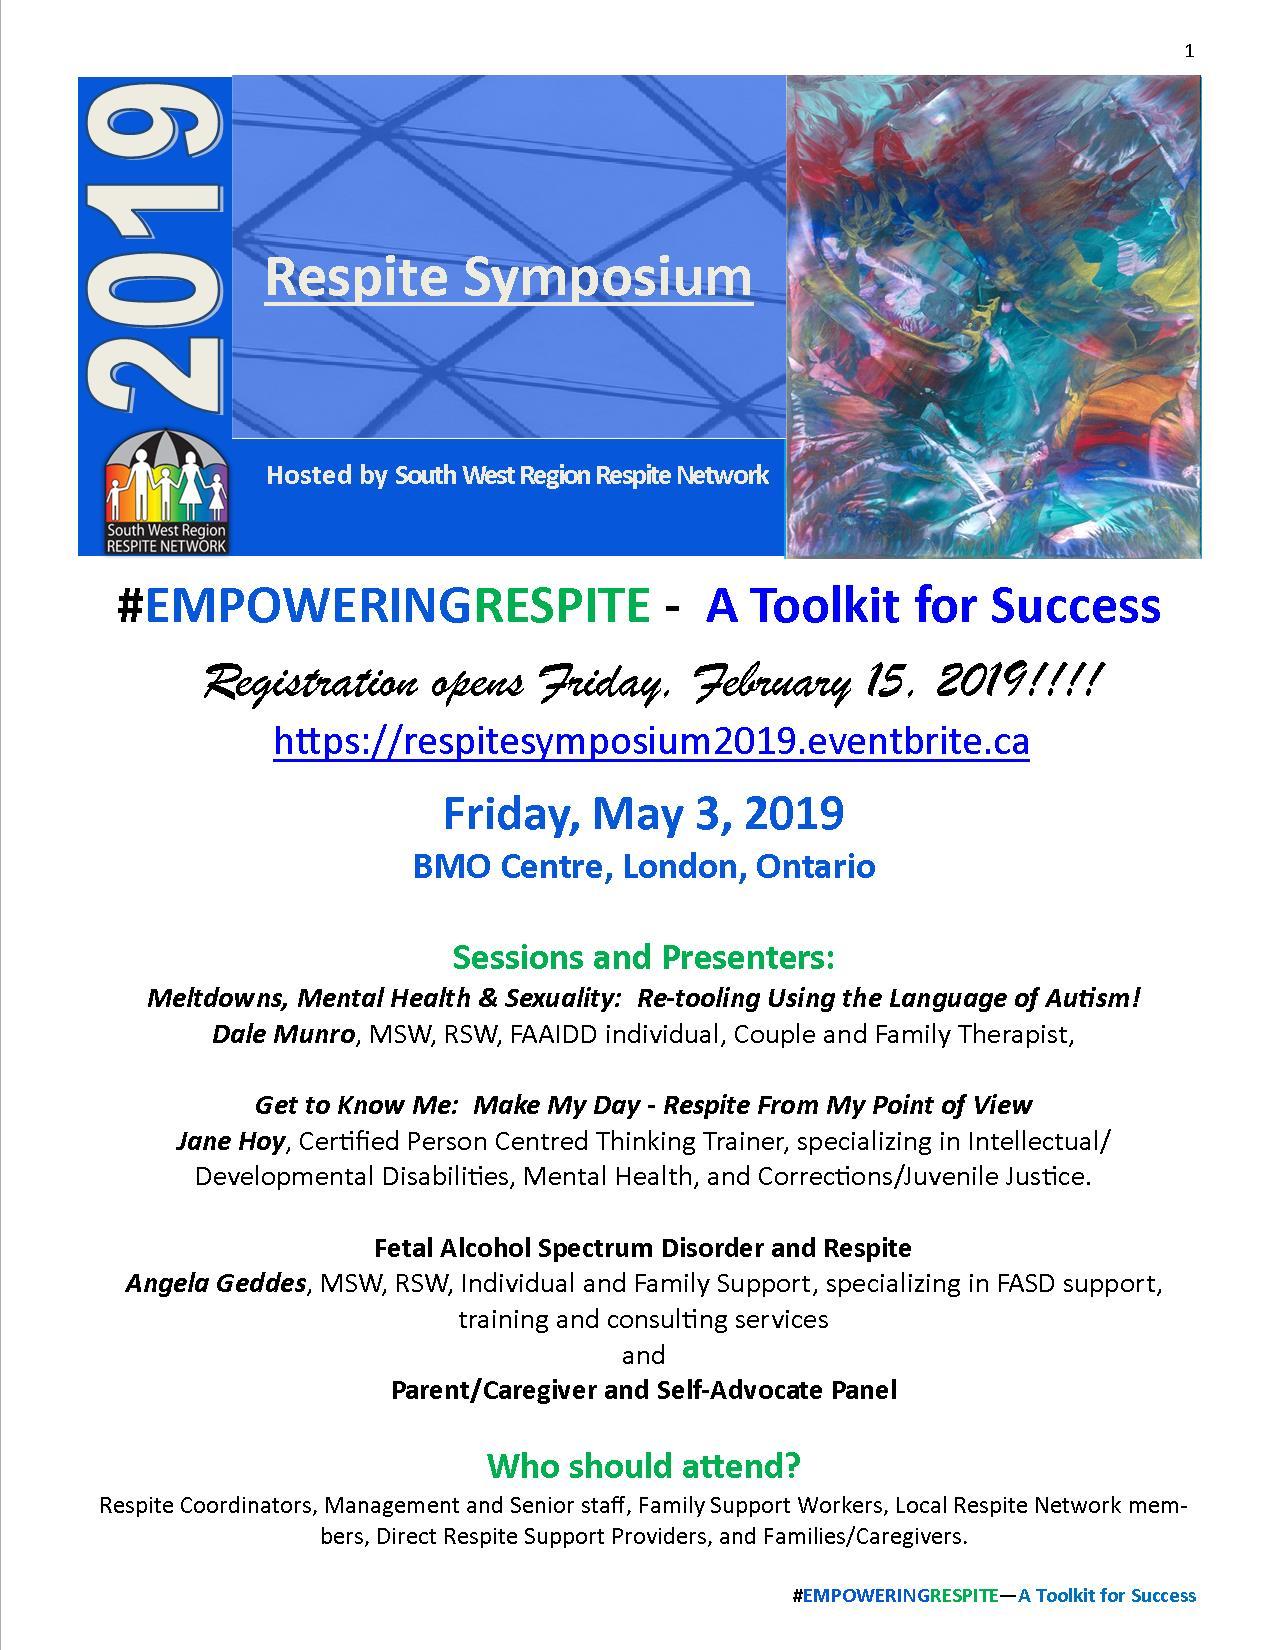 Respite Symposium 2019 Flyer